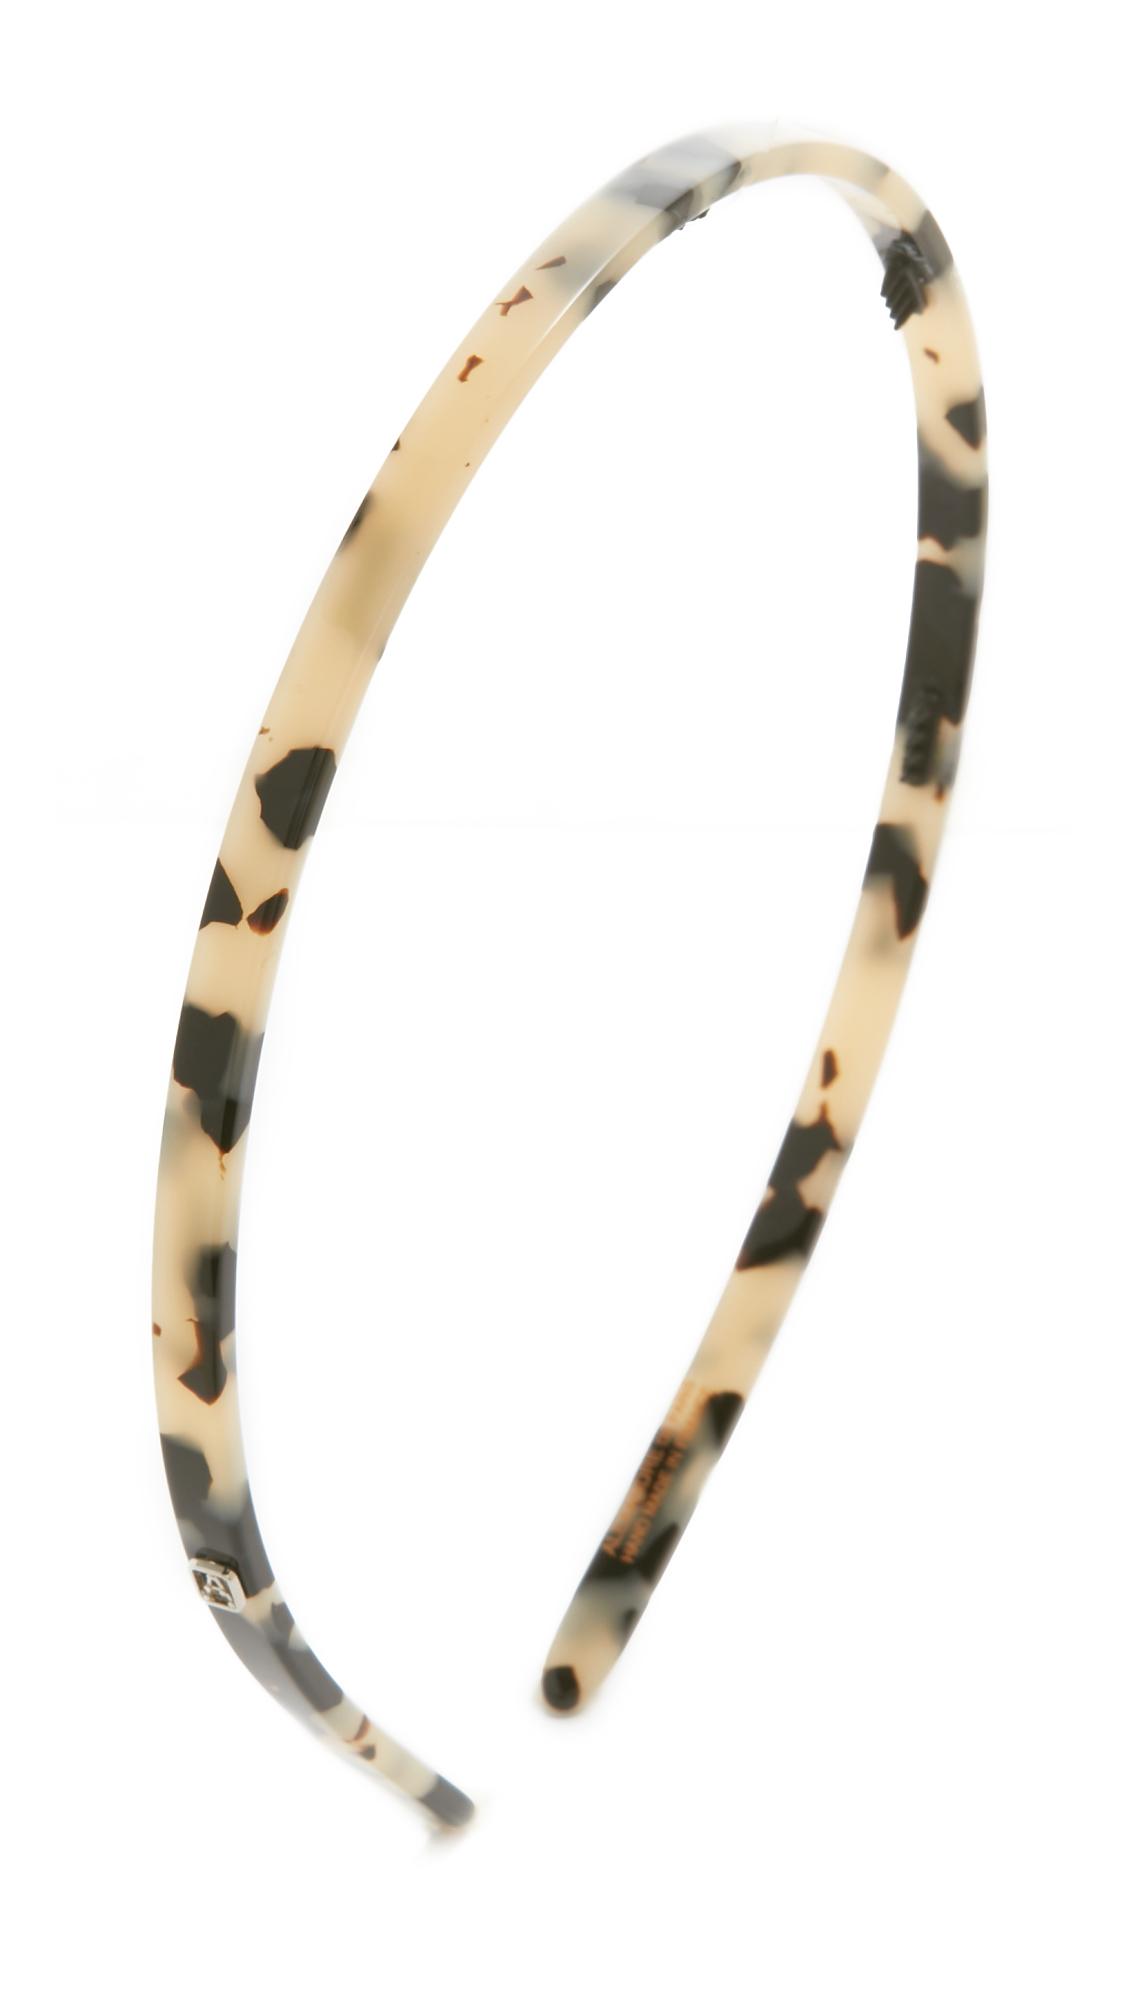 Alexandre De Paris Thin Headband - Albinos at Shopbop